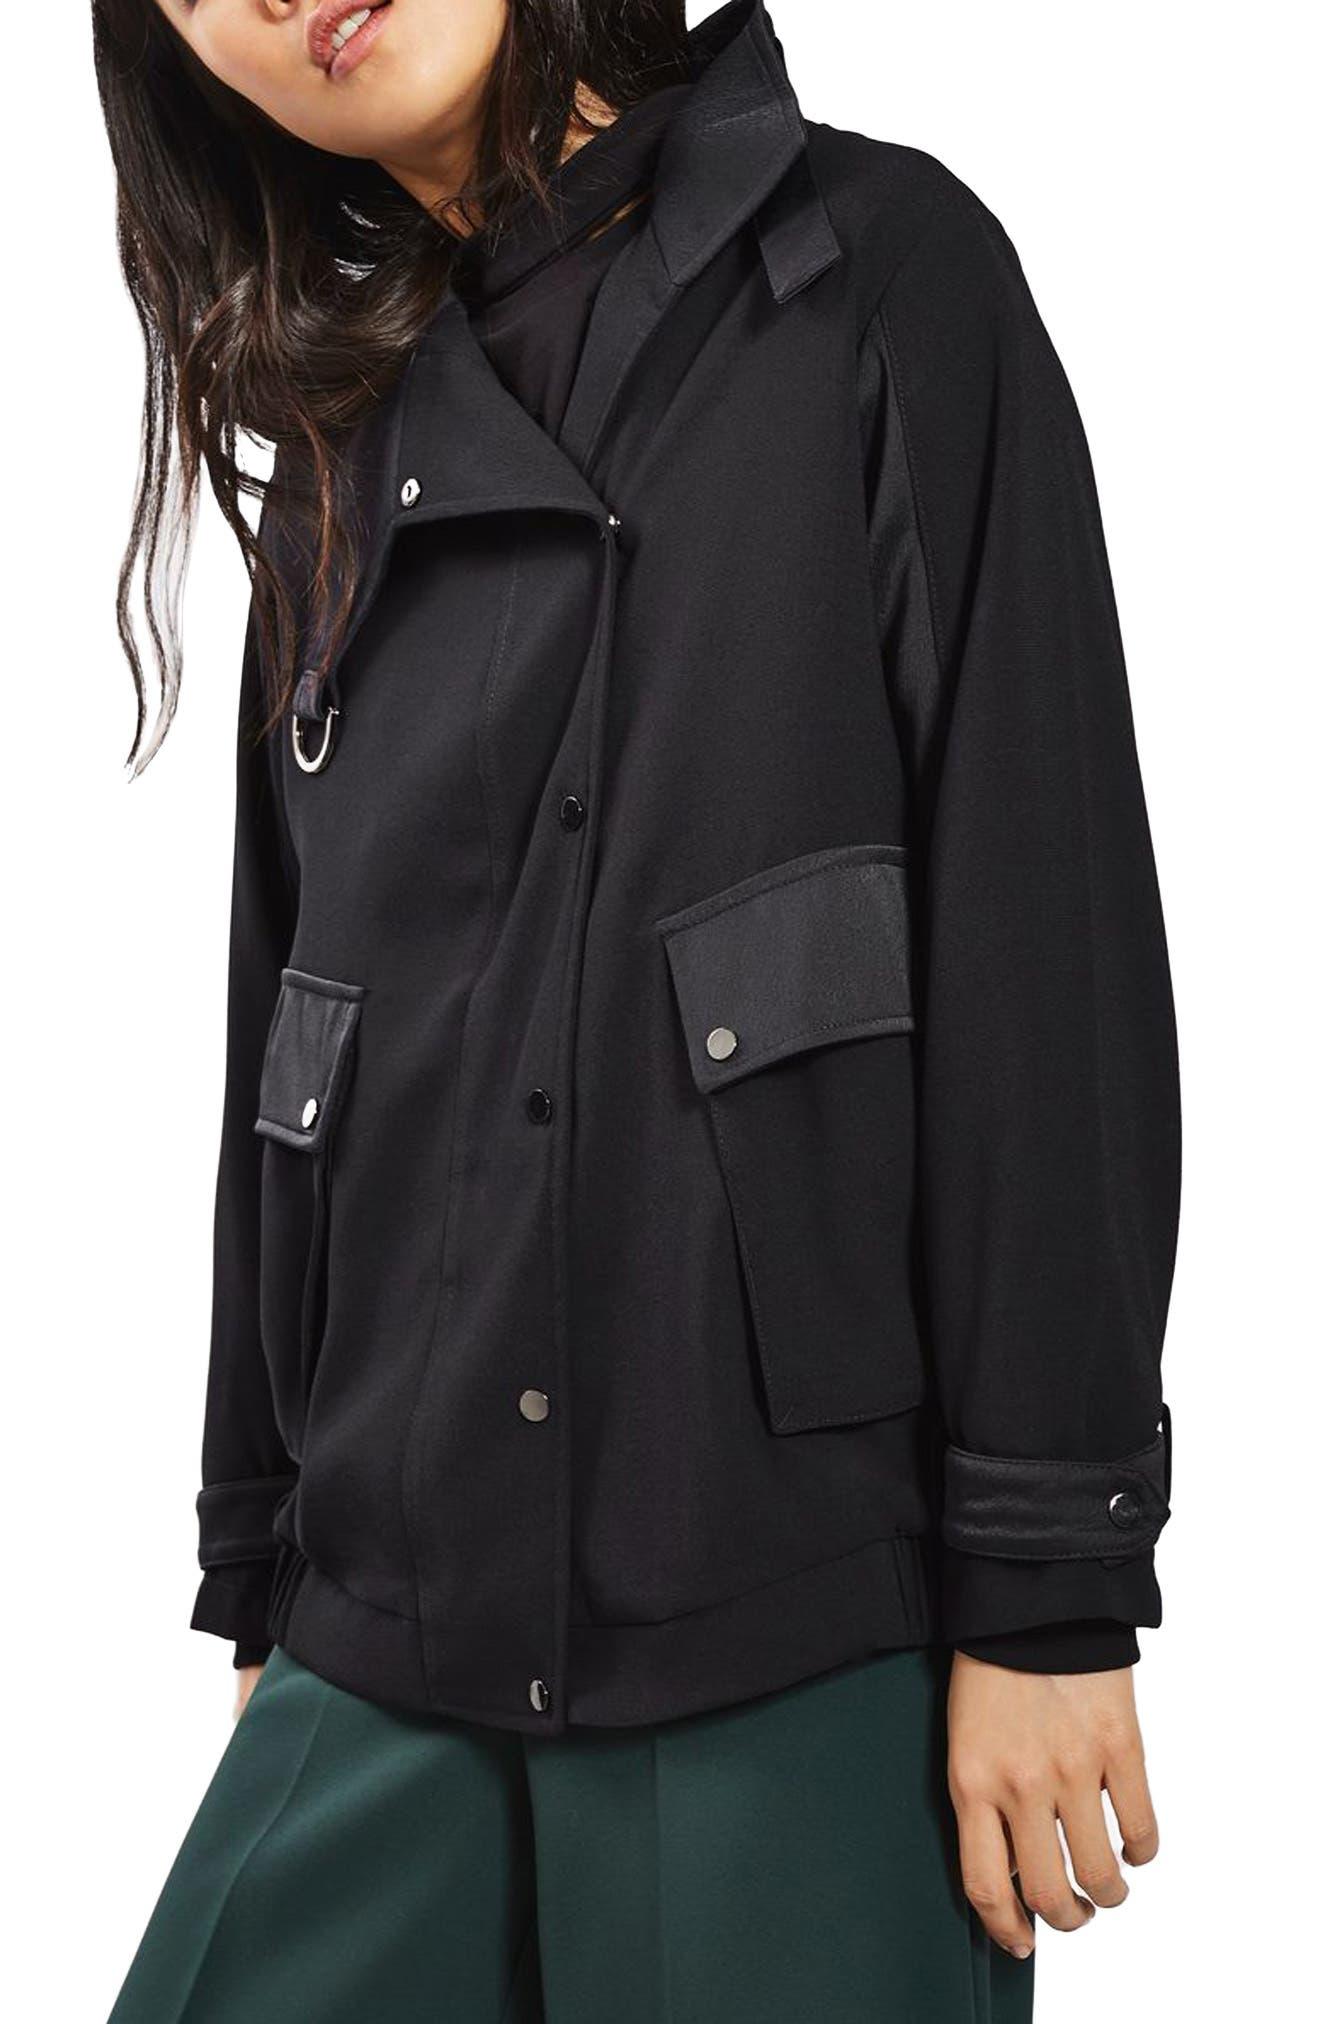 Urban Popper Jacket,                             Main thumbnail 1, color,                             410